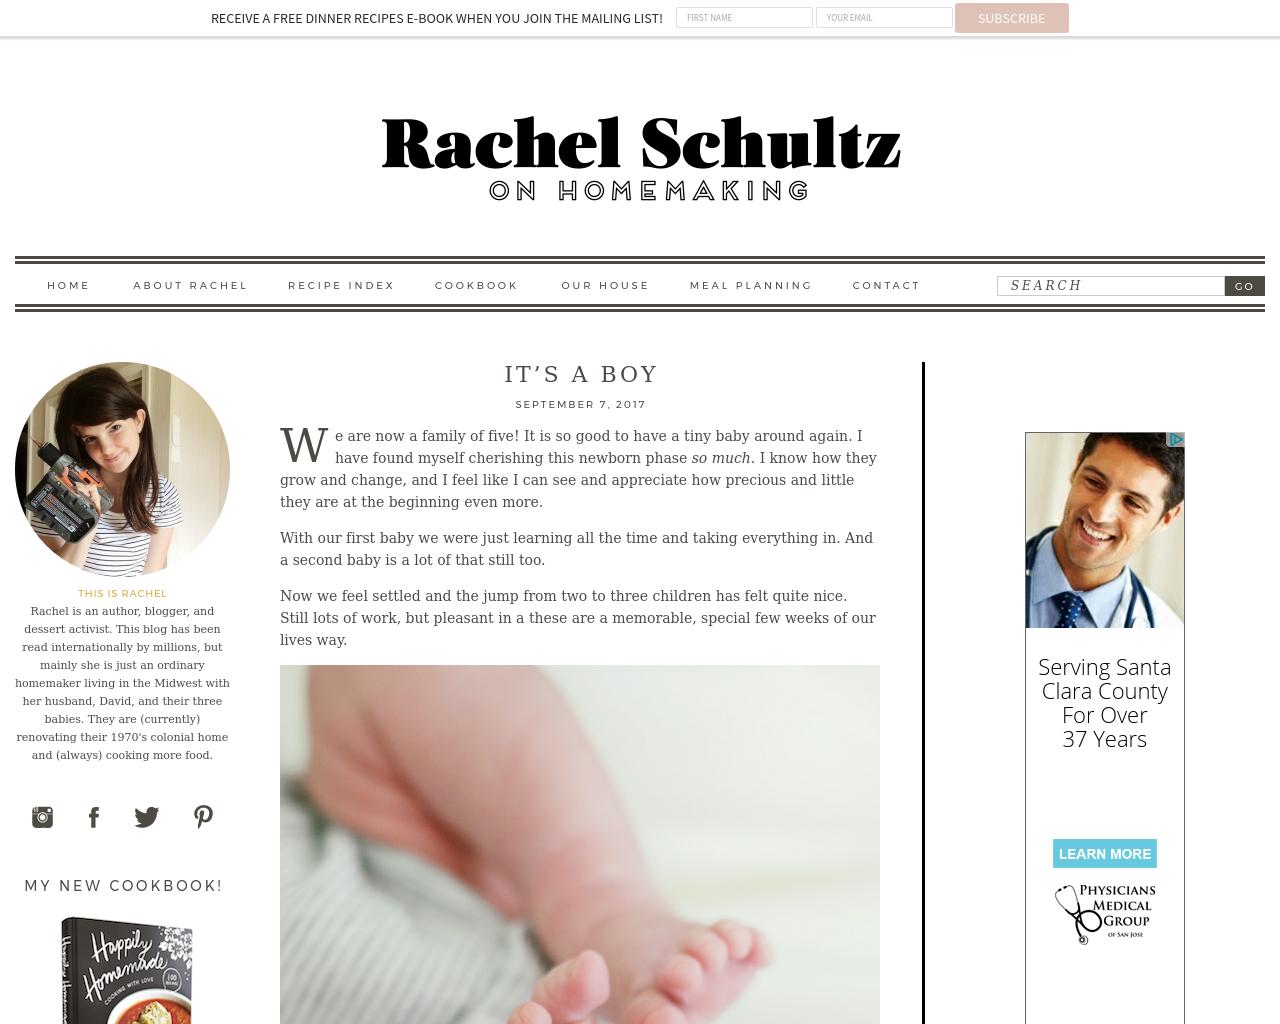 Rachel-Schultz-Advertising-Reviews-Pricing